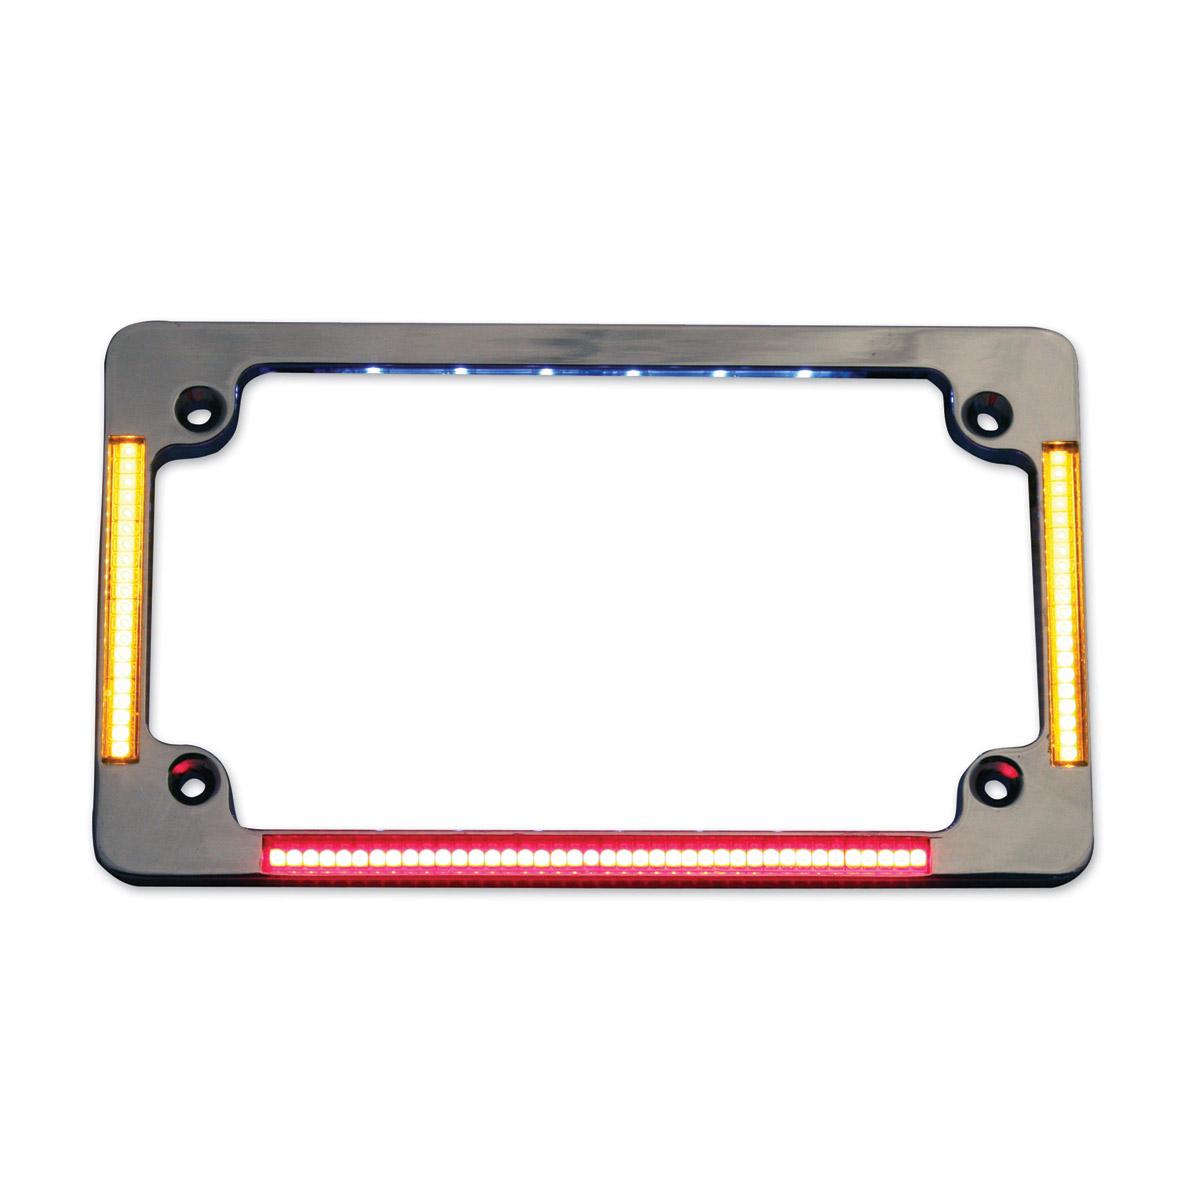 Custom Dynamics Chrome All-In-One Flat License Plate